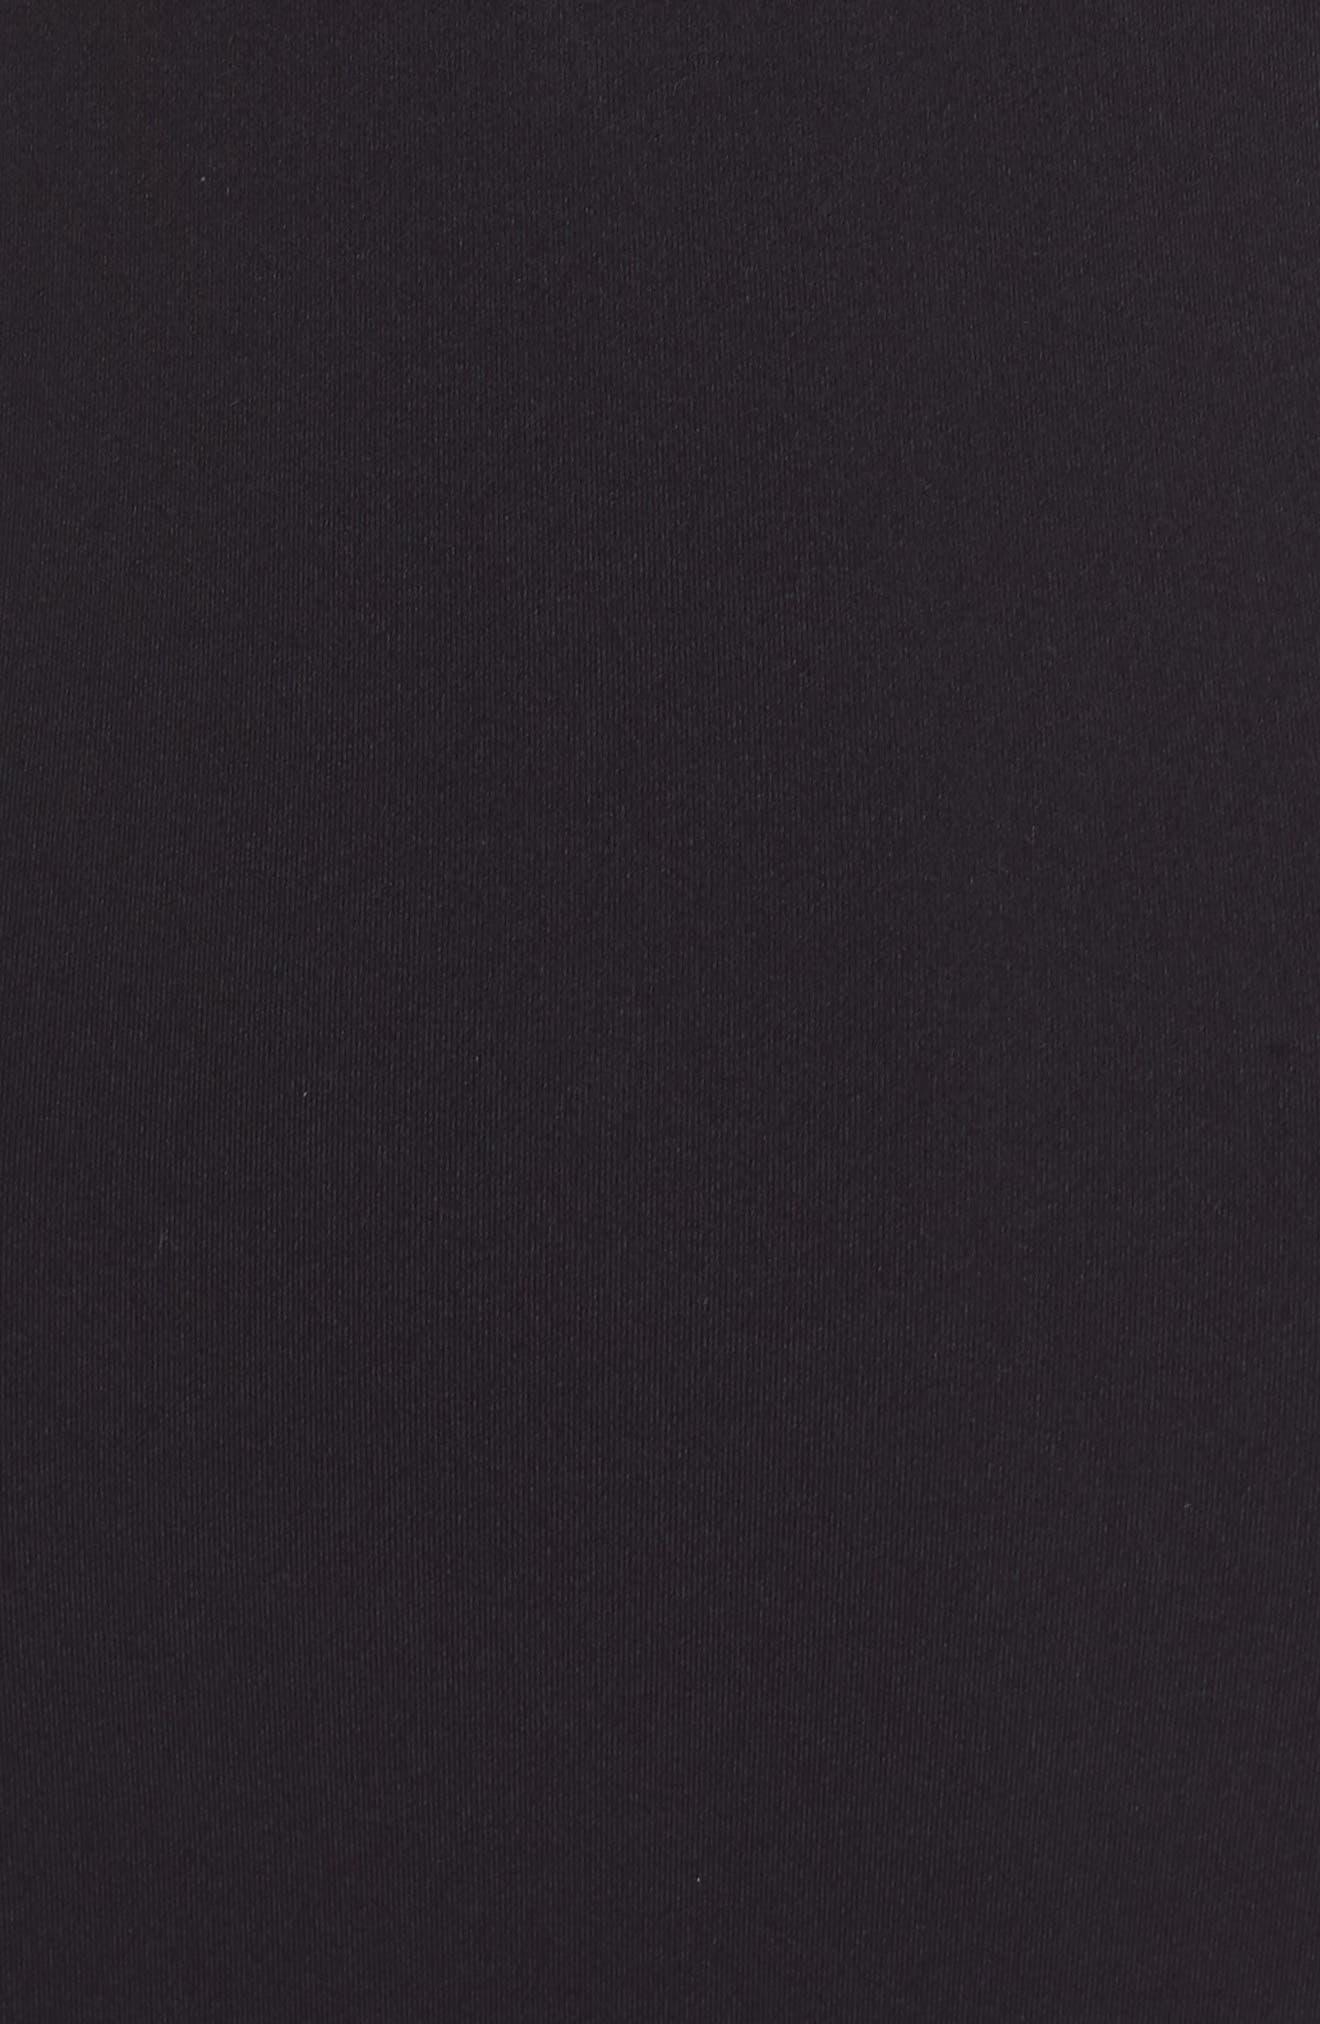 FP Movement Serene Catsuit,                             Alternate thumbnail 6, color,                             BLACK